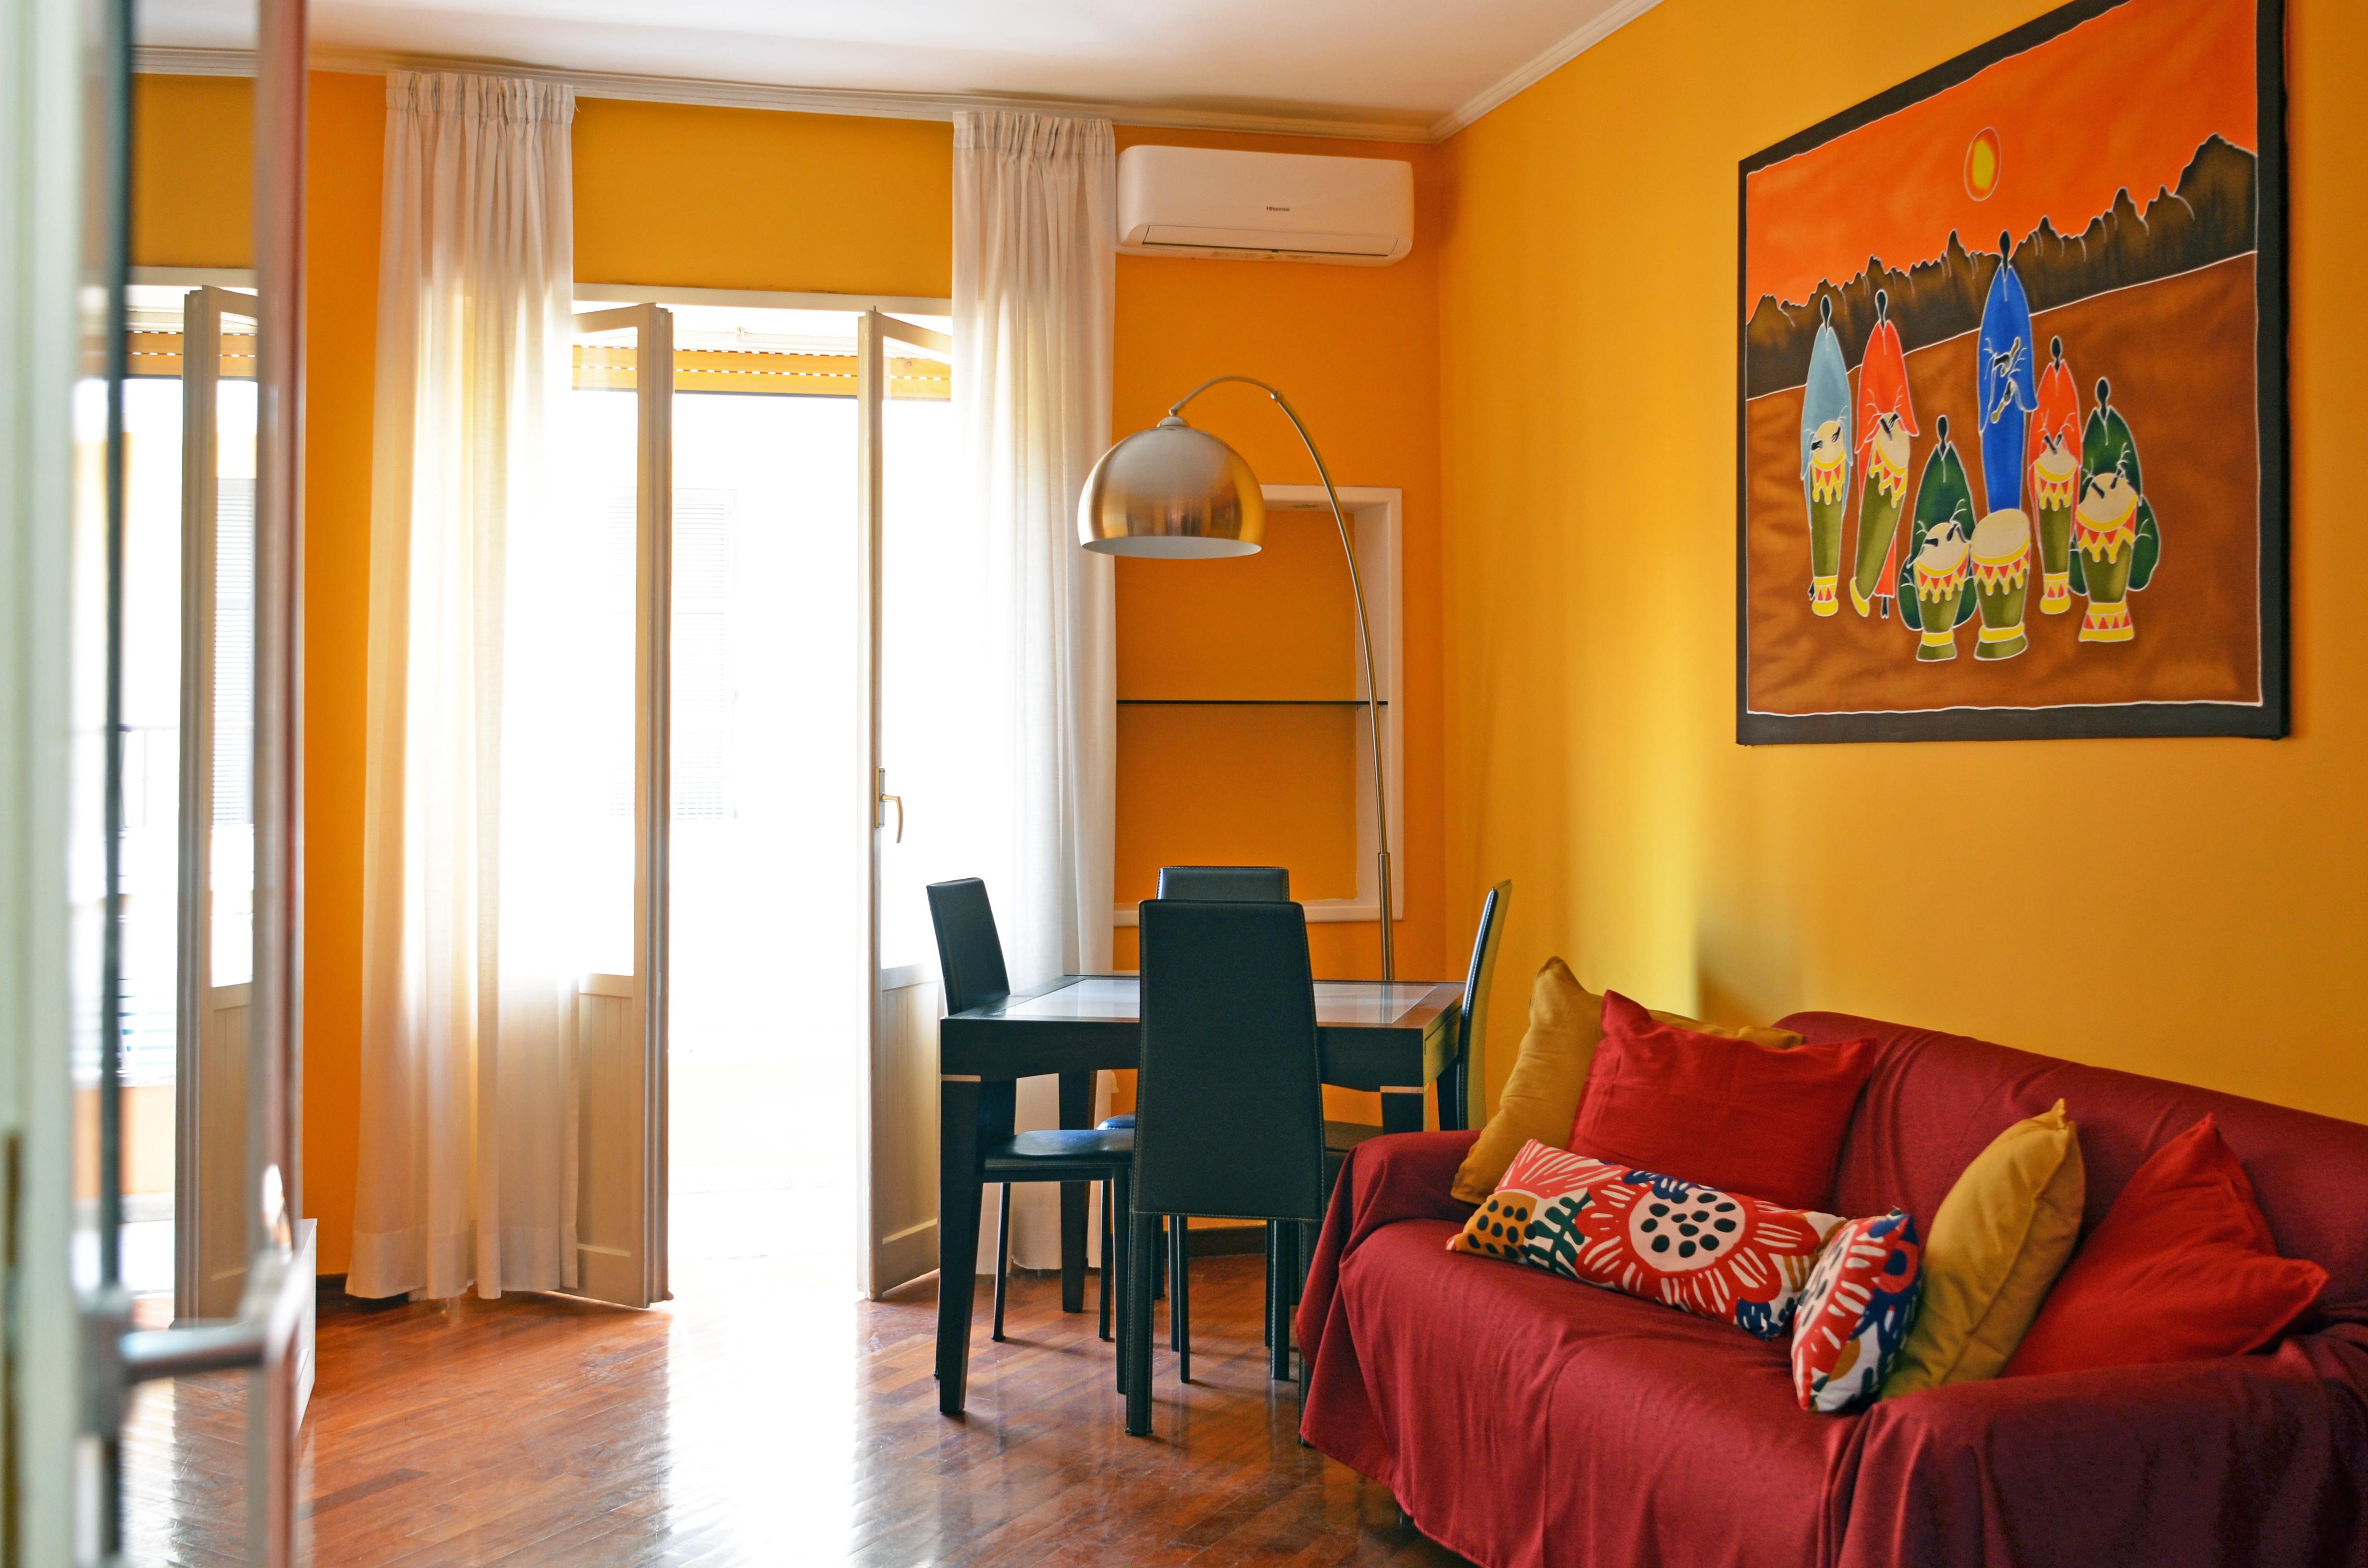 Quadri Per Sala Da Pranzo edo house monteverde, salone